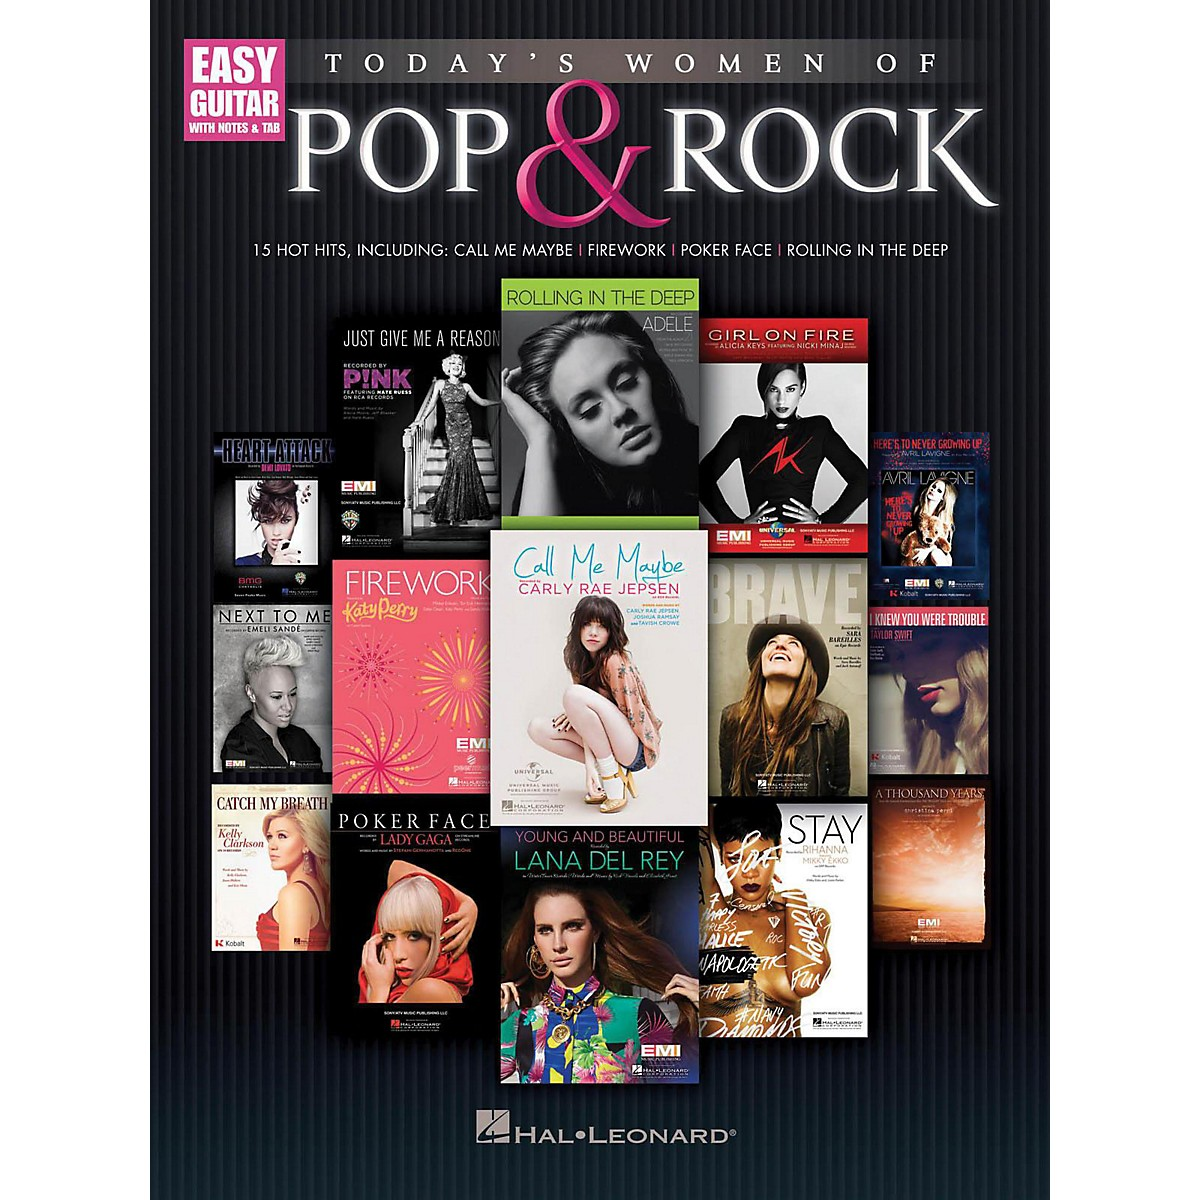 Hal Leonard Today's Women Of Pop & Rock (Easy Guitar With Tab)